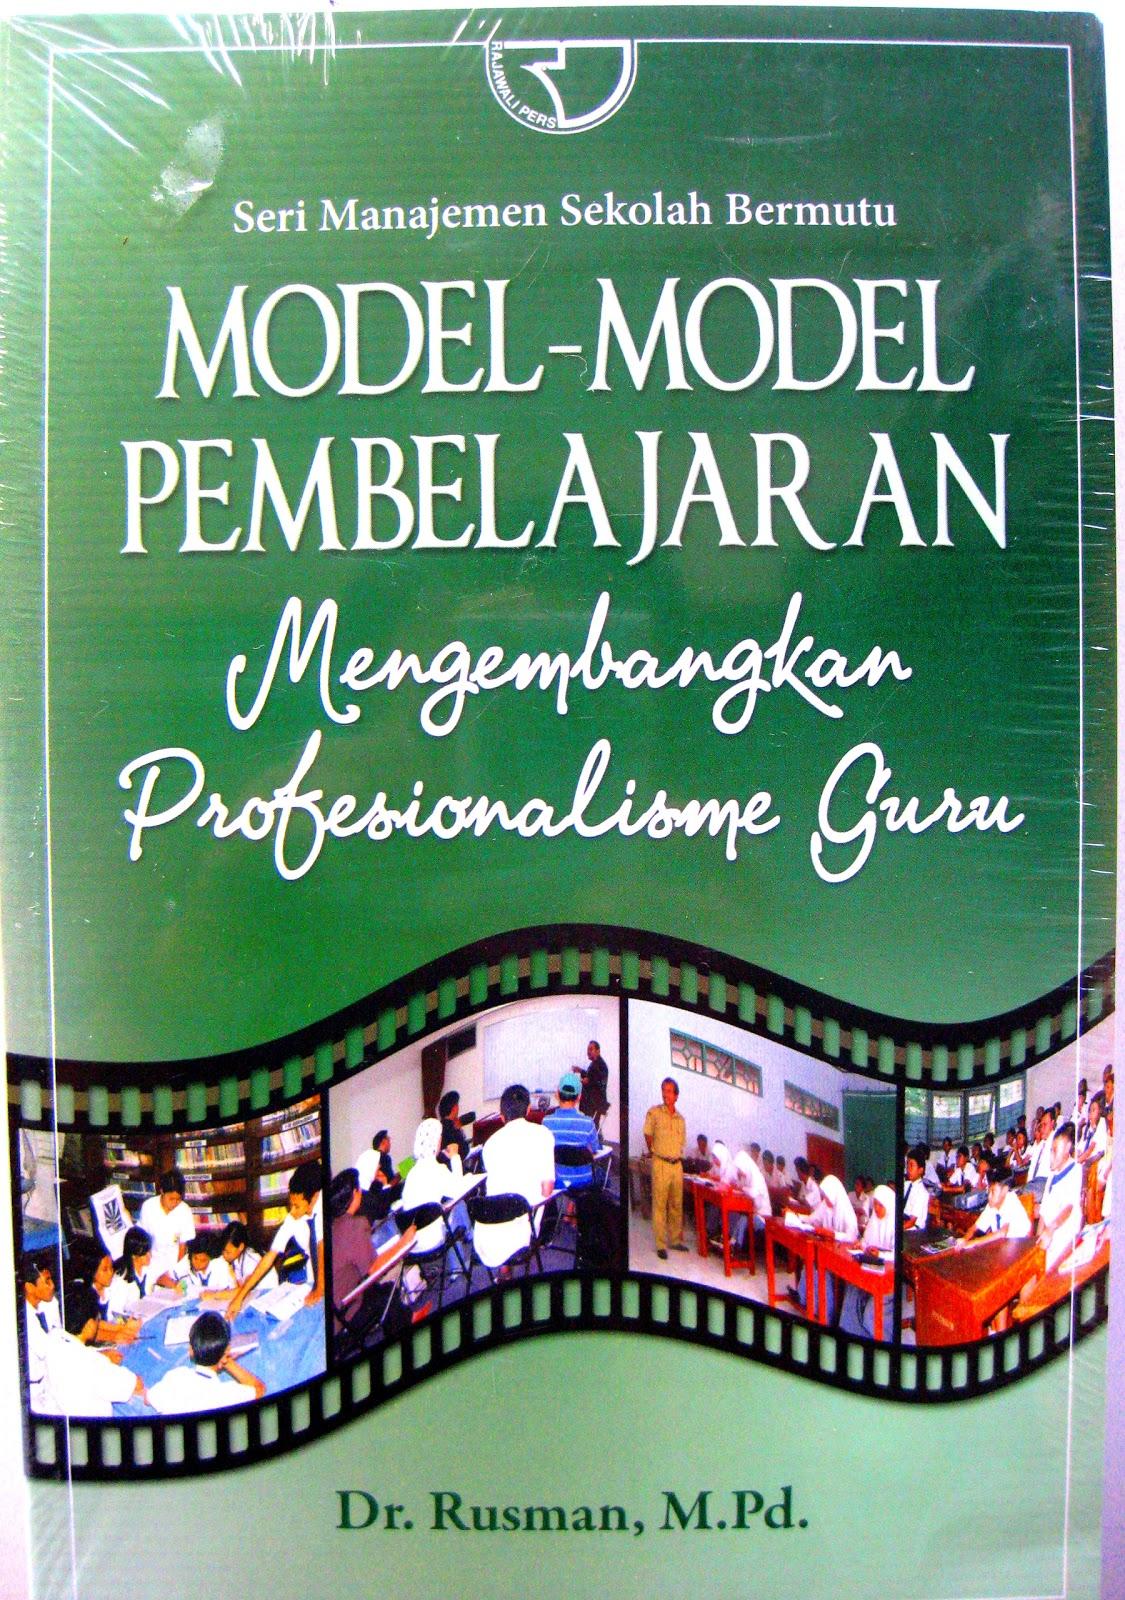 Buku ini yang terbaru dan terlengkap mengulas semua model-model